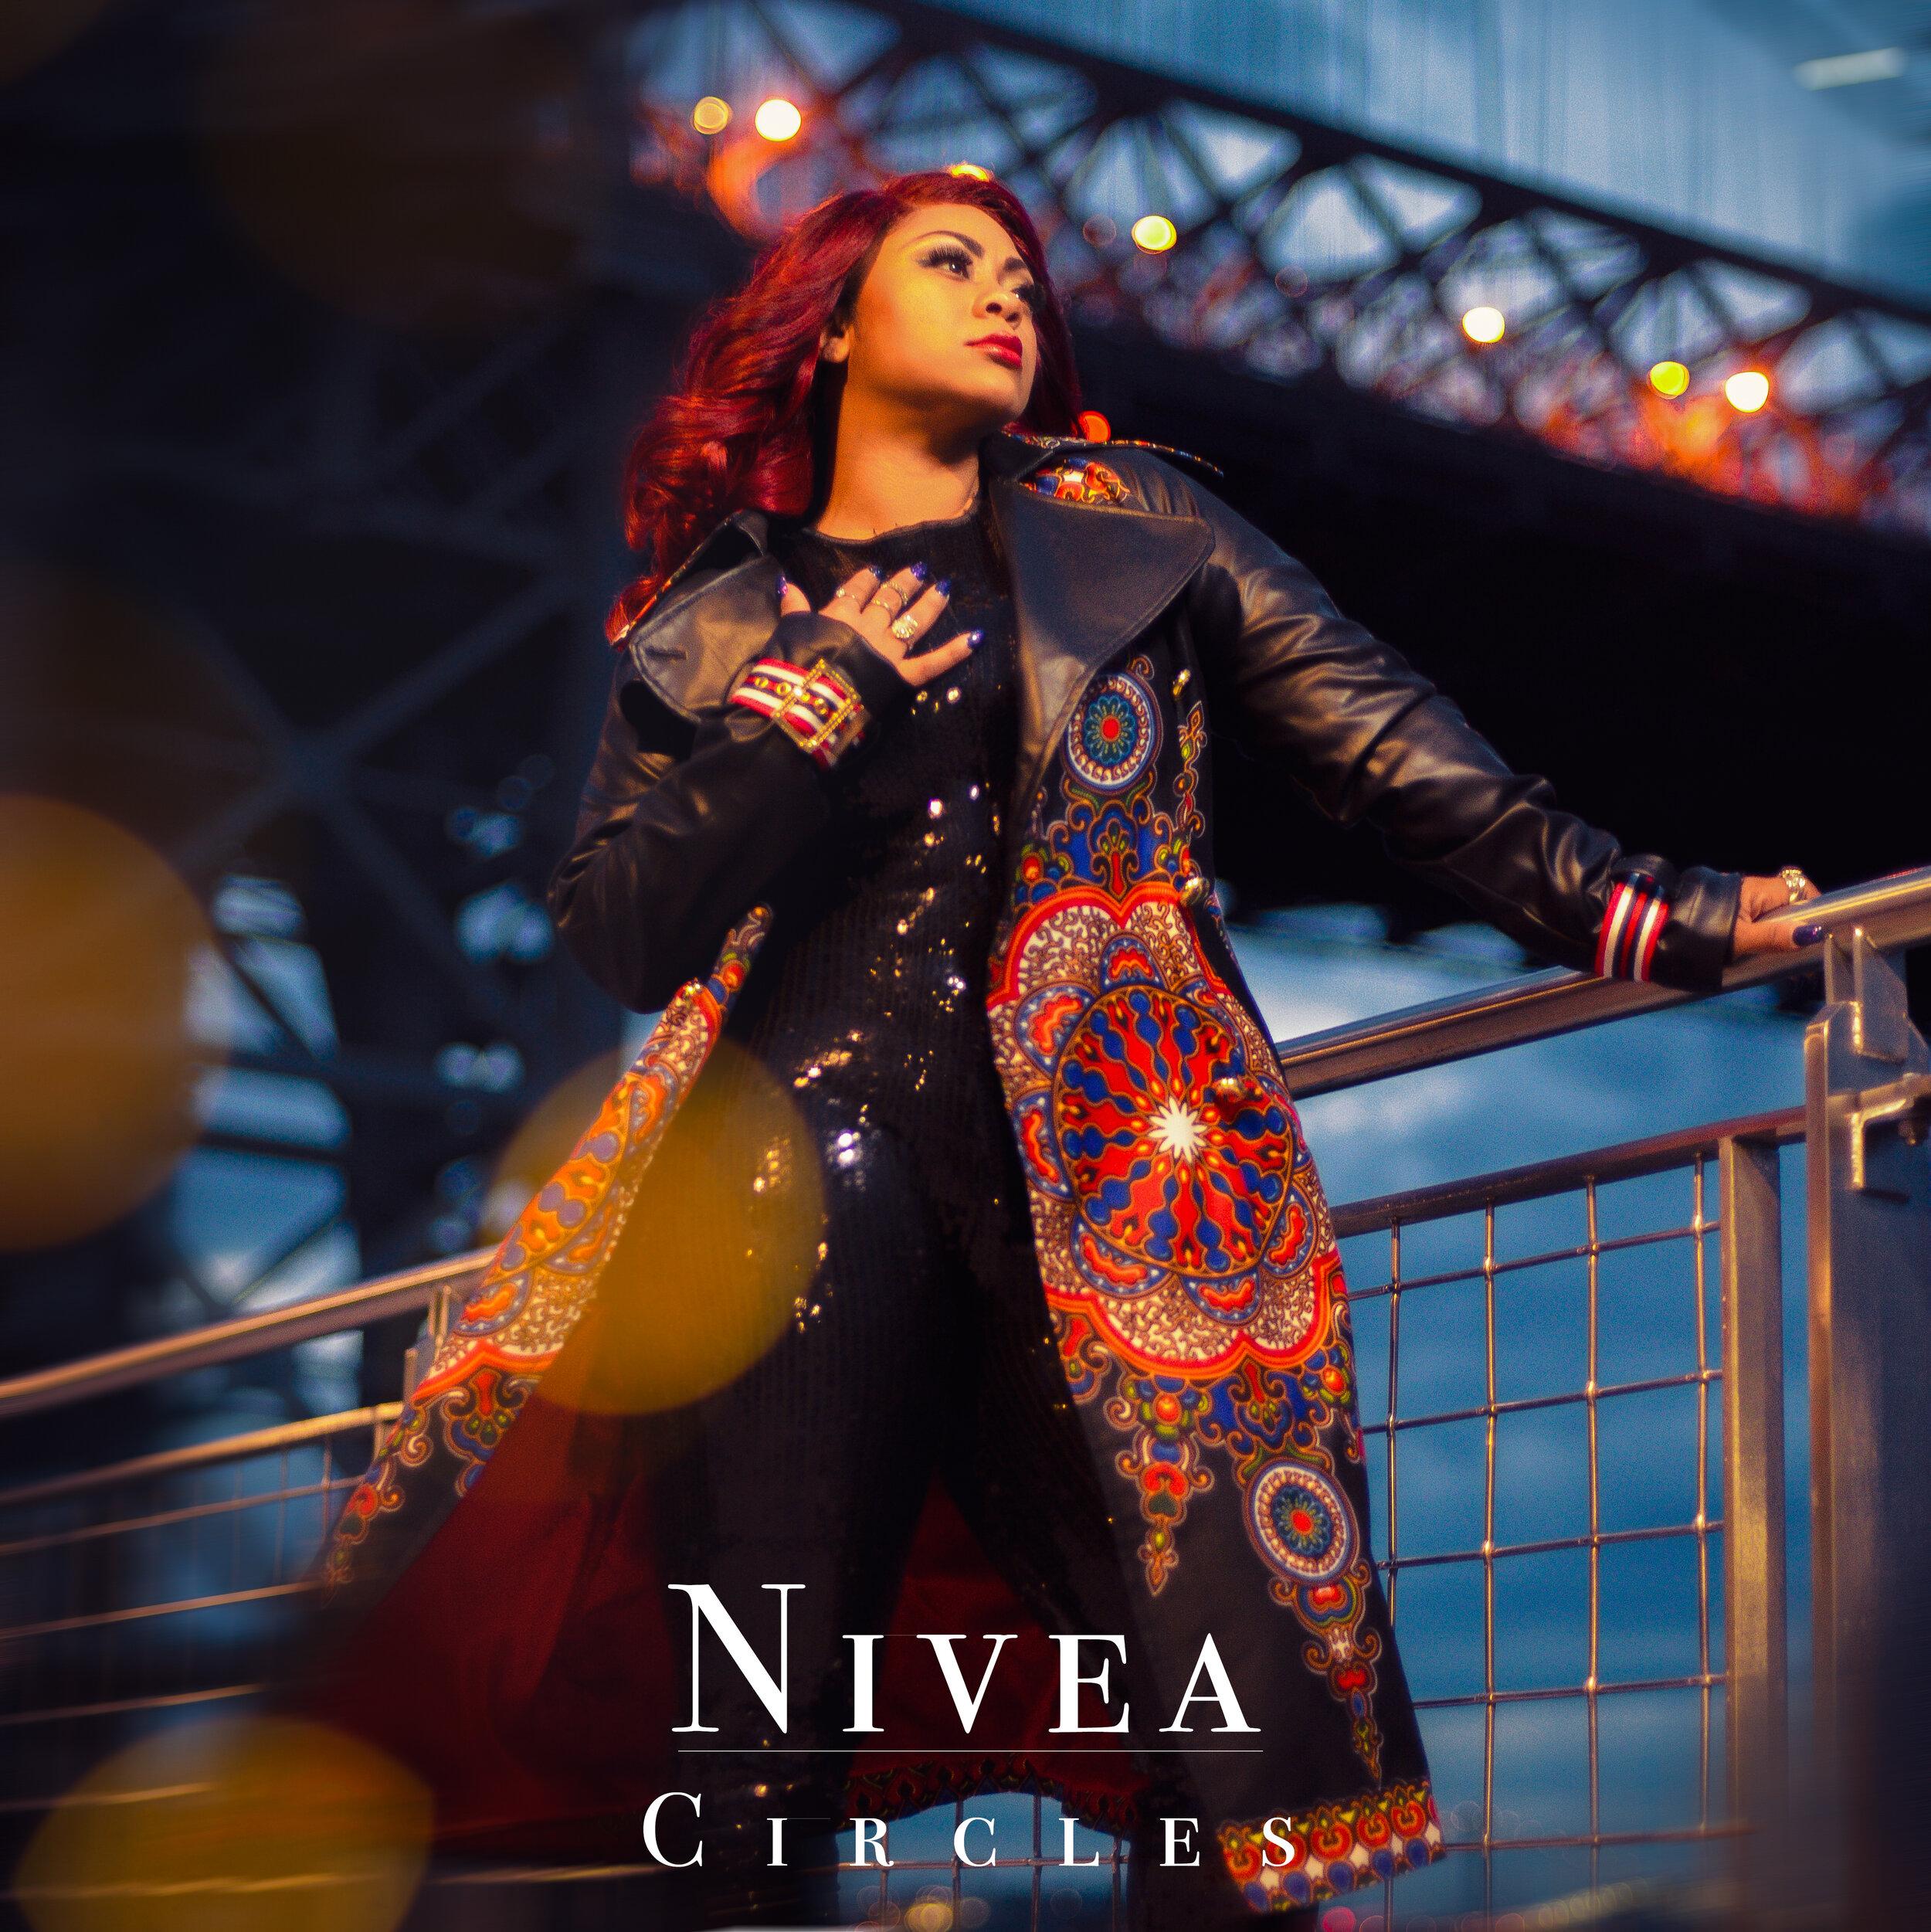 Nivea Circles Single Cover Art.jpg